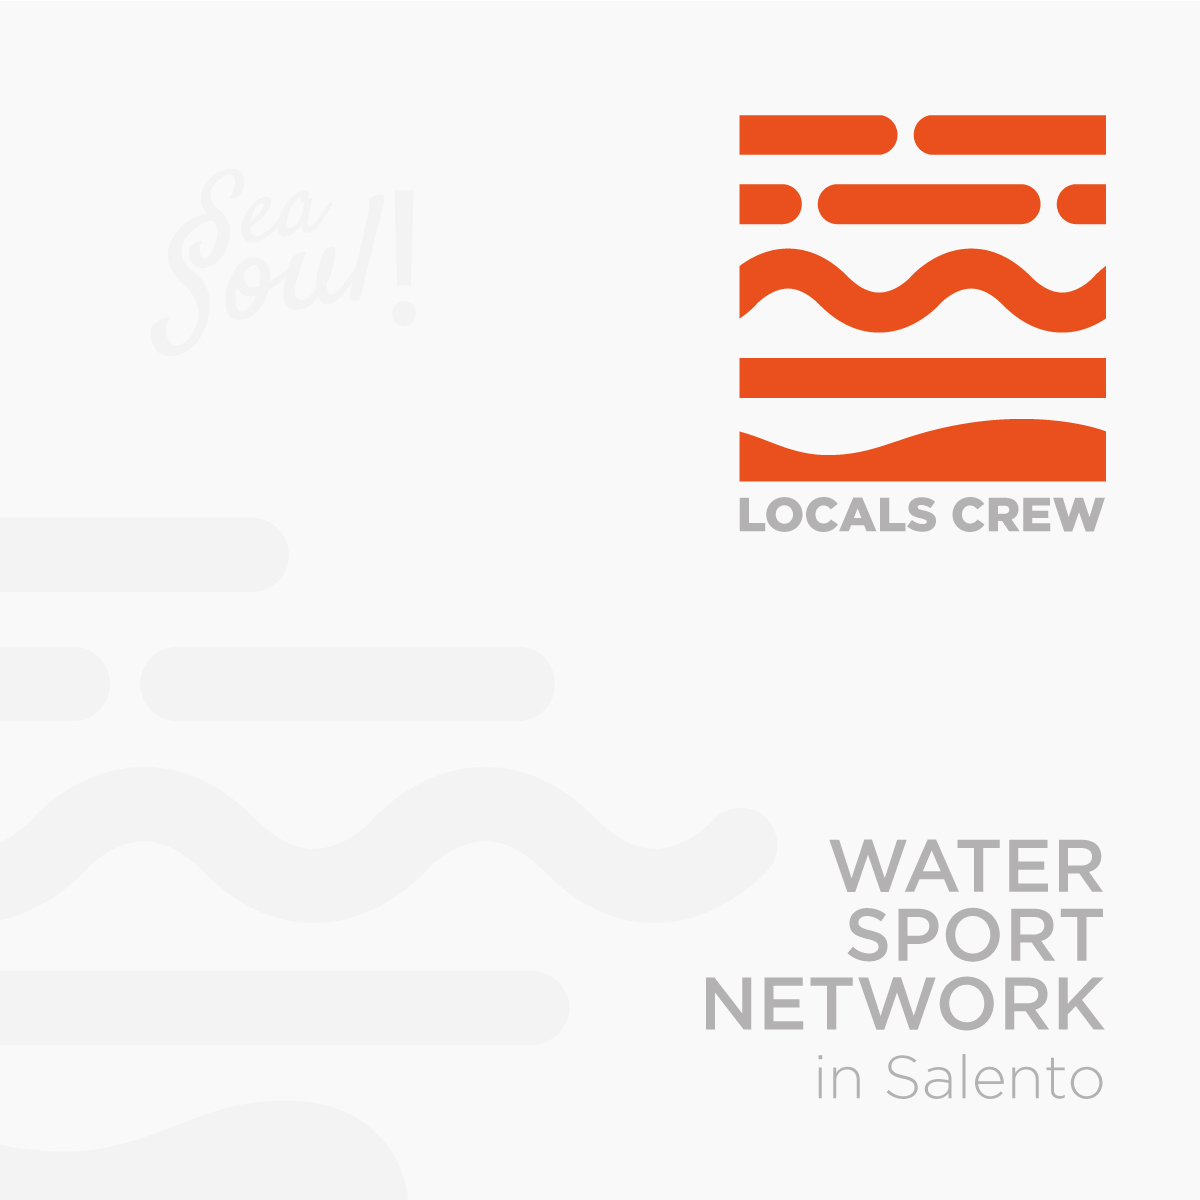 https://www.orlandinifrancesco.com/wp/wp-content/uploads/2019/02/Local-Crew-Salento-Logo-04.jpg